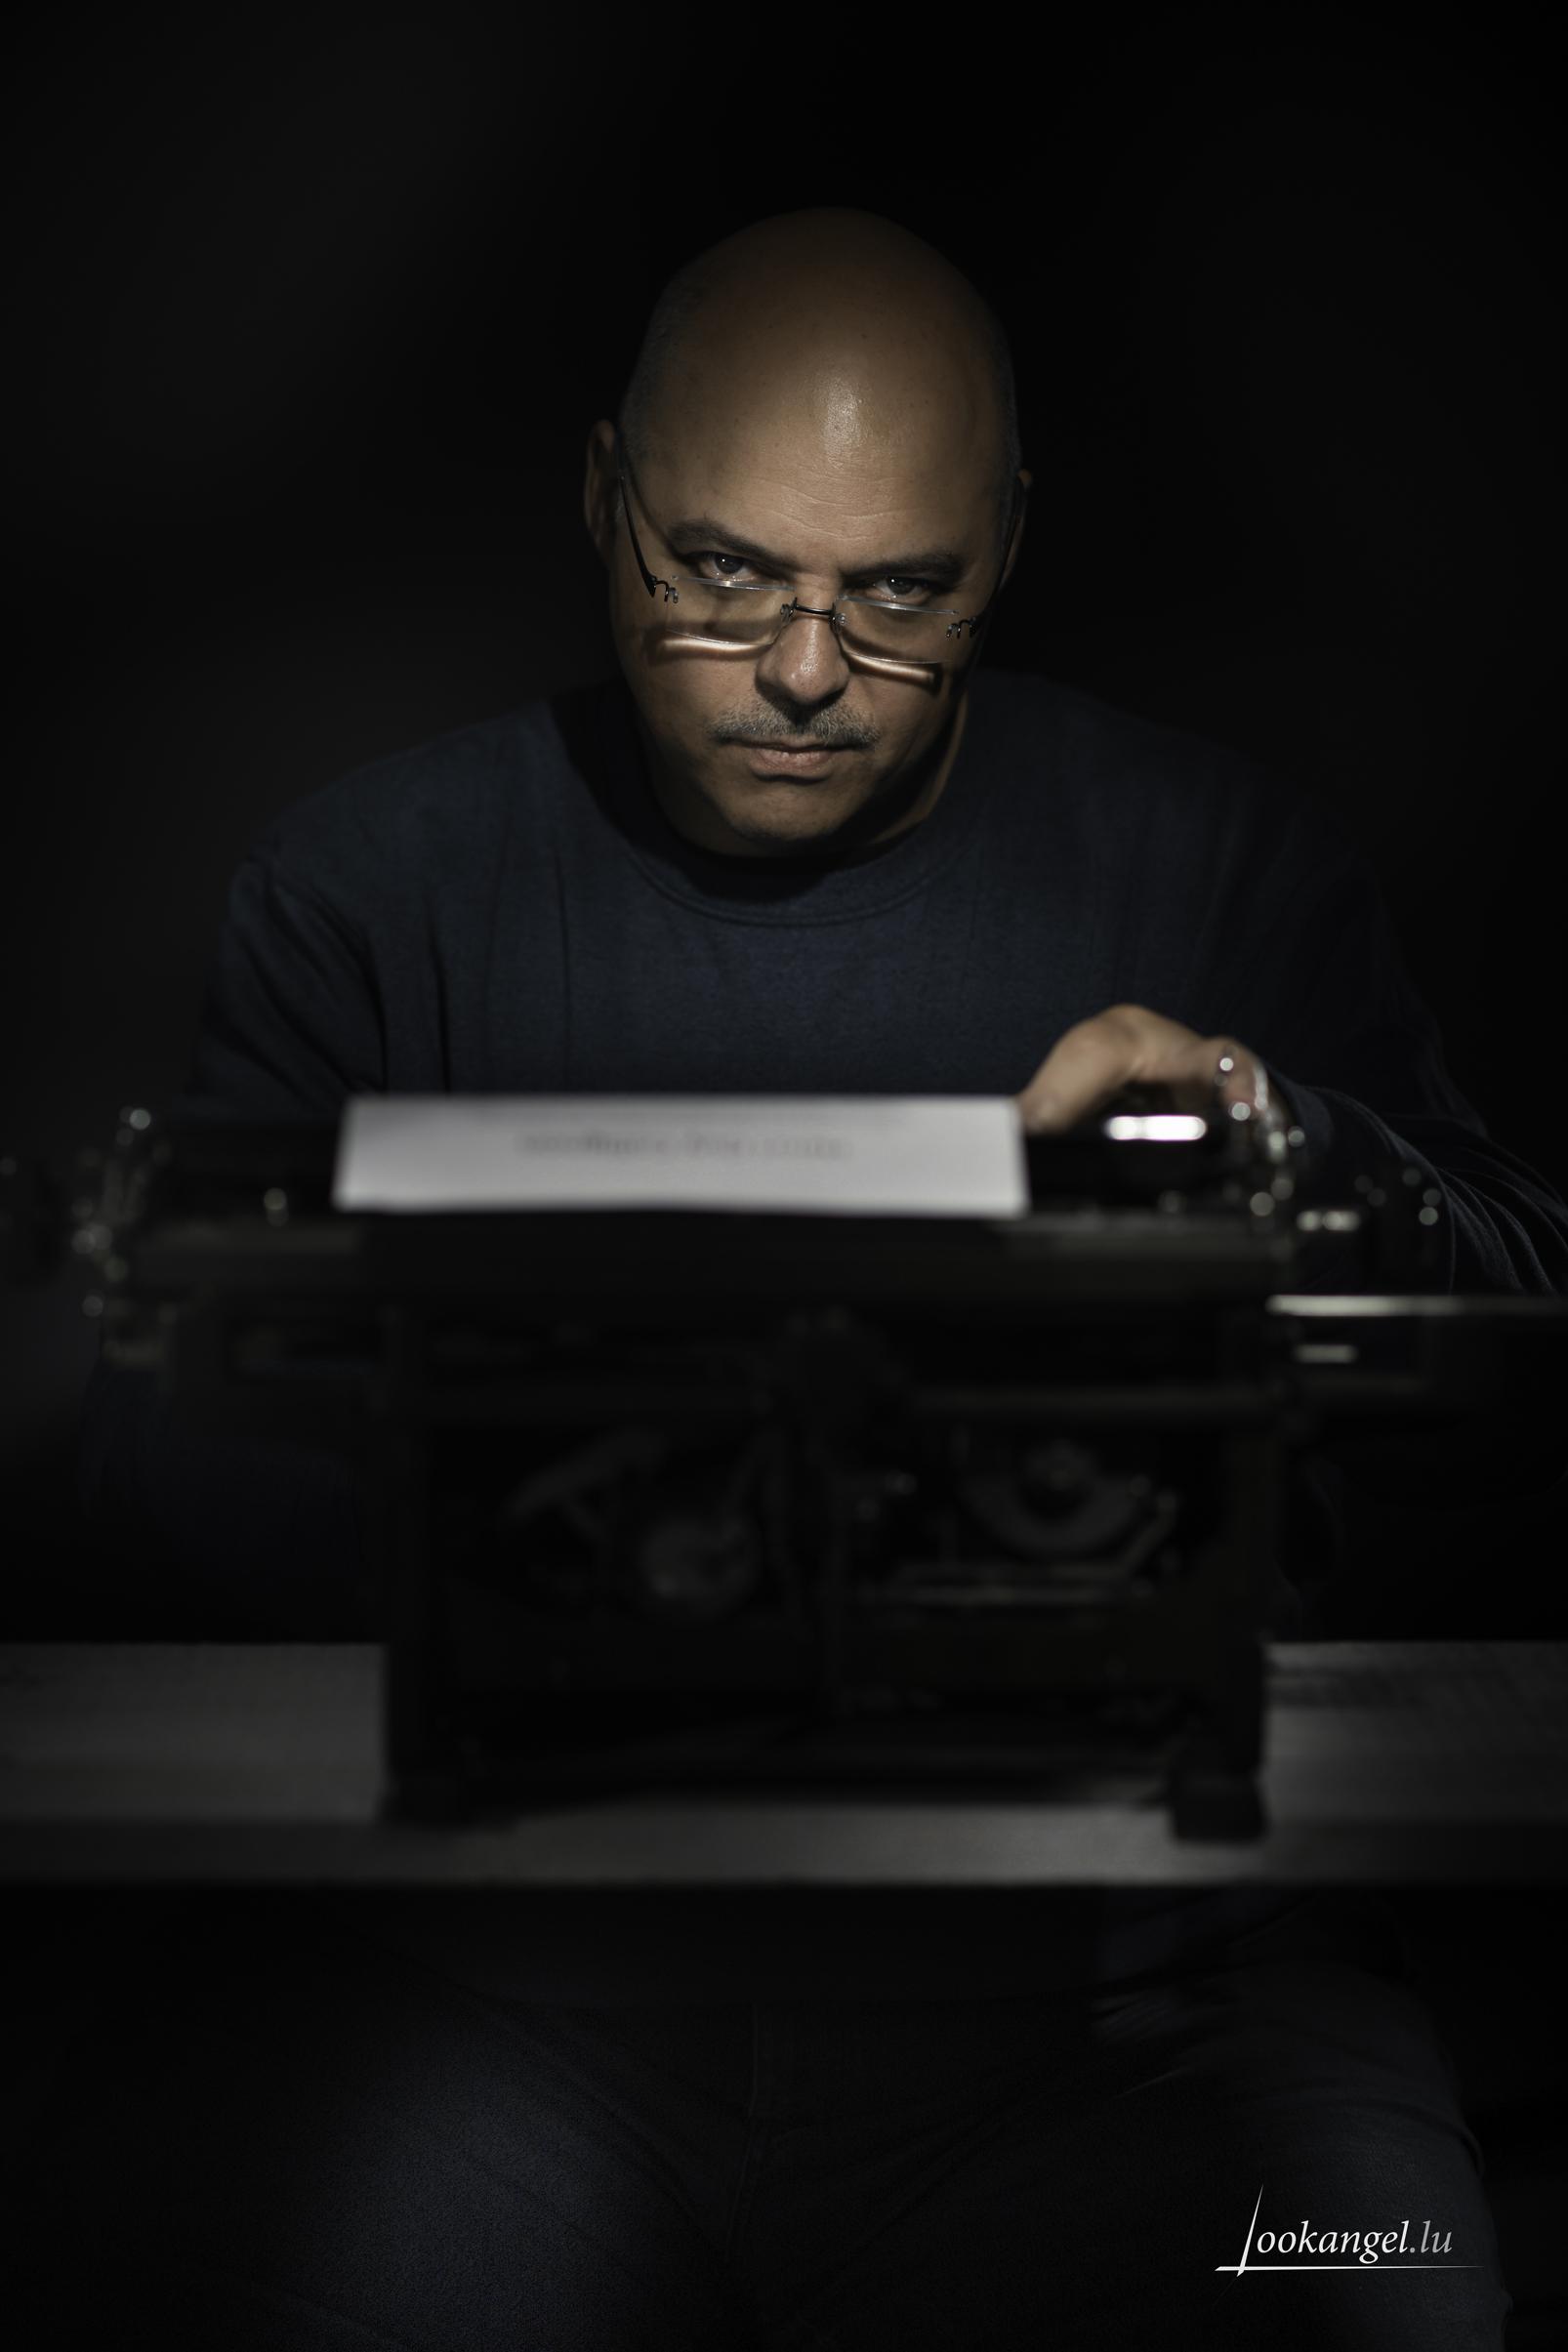 Henri Guy Collignon (2020)